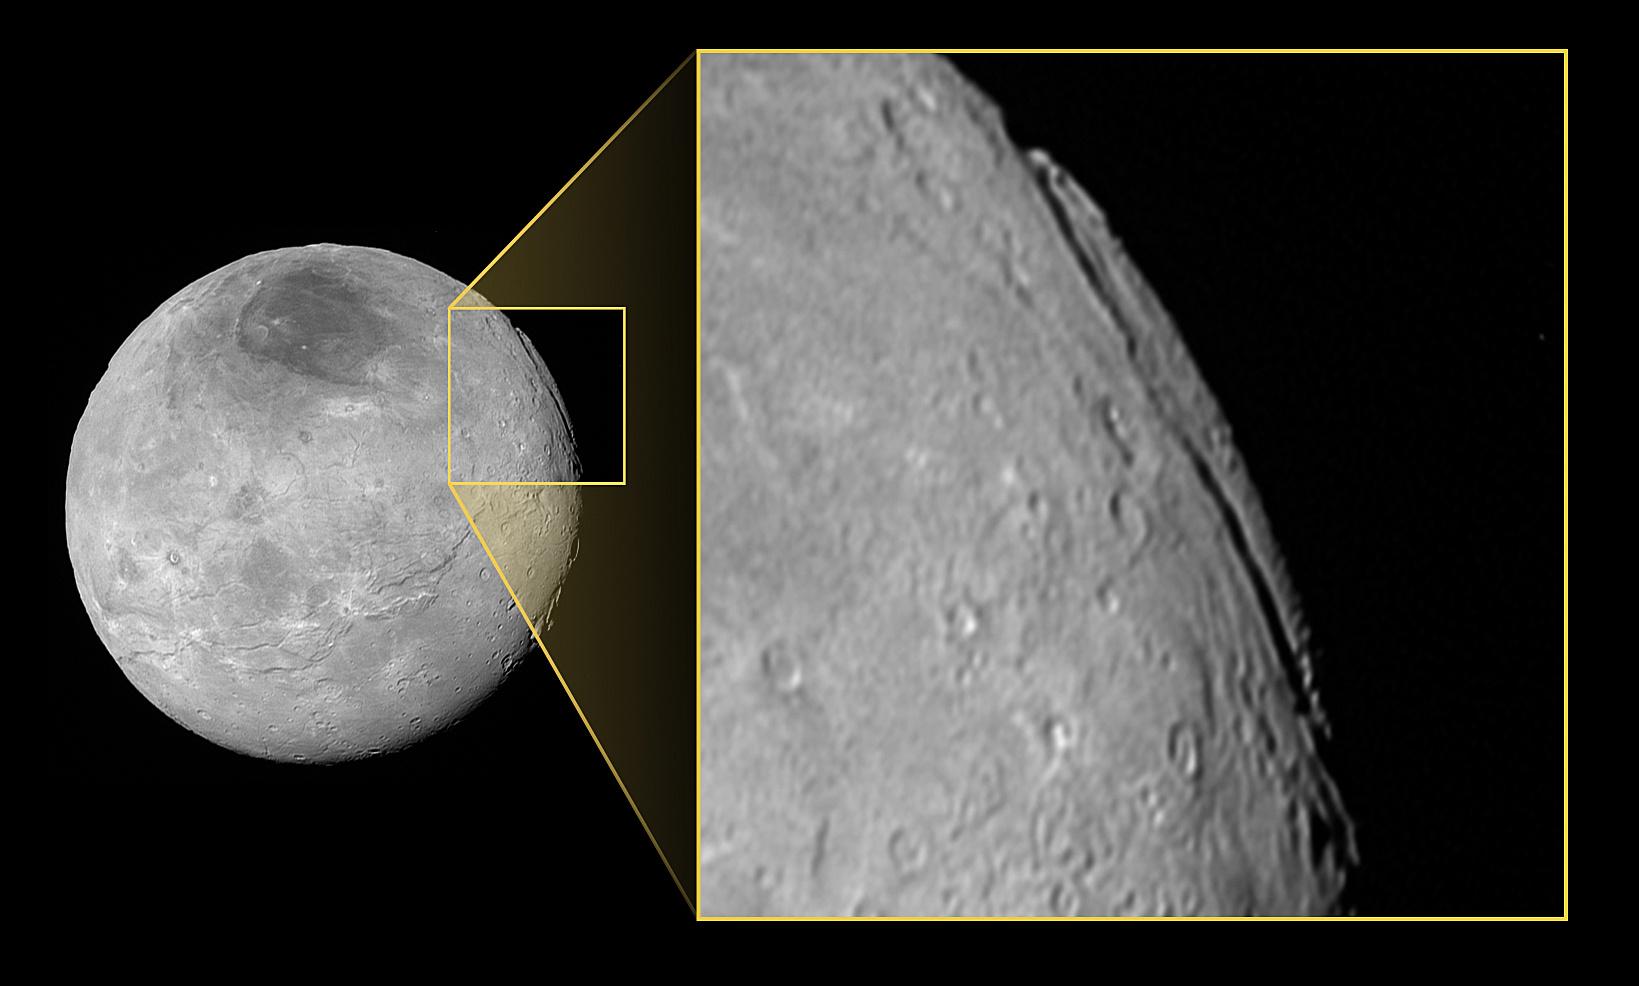 Charon Moon: A 'super Grand Canyon' On Pluto's Moon Charon